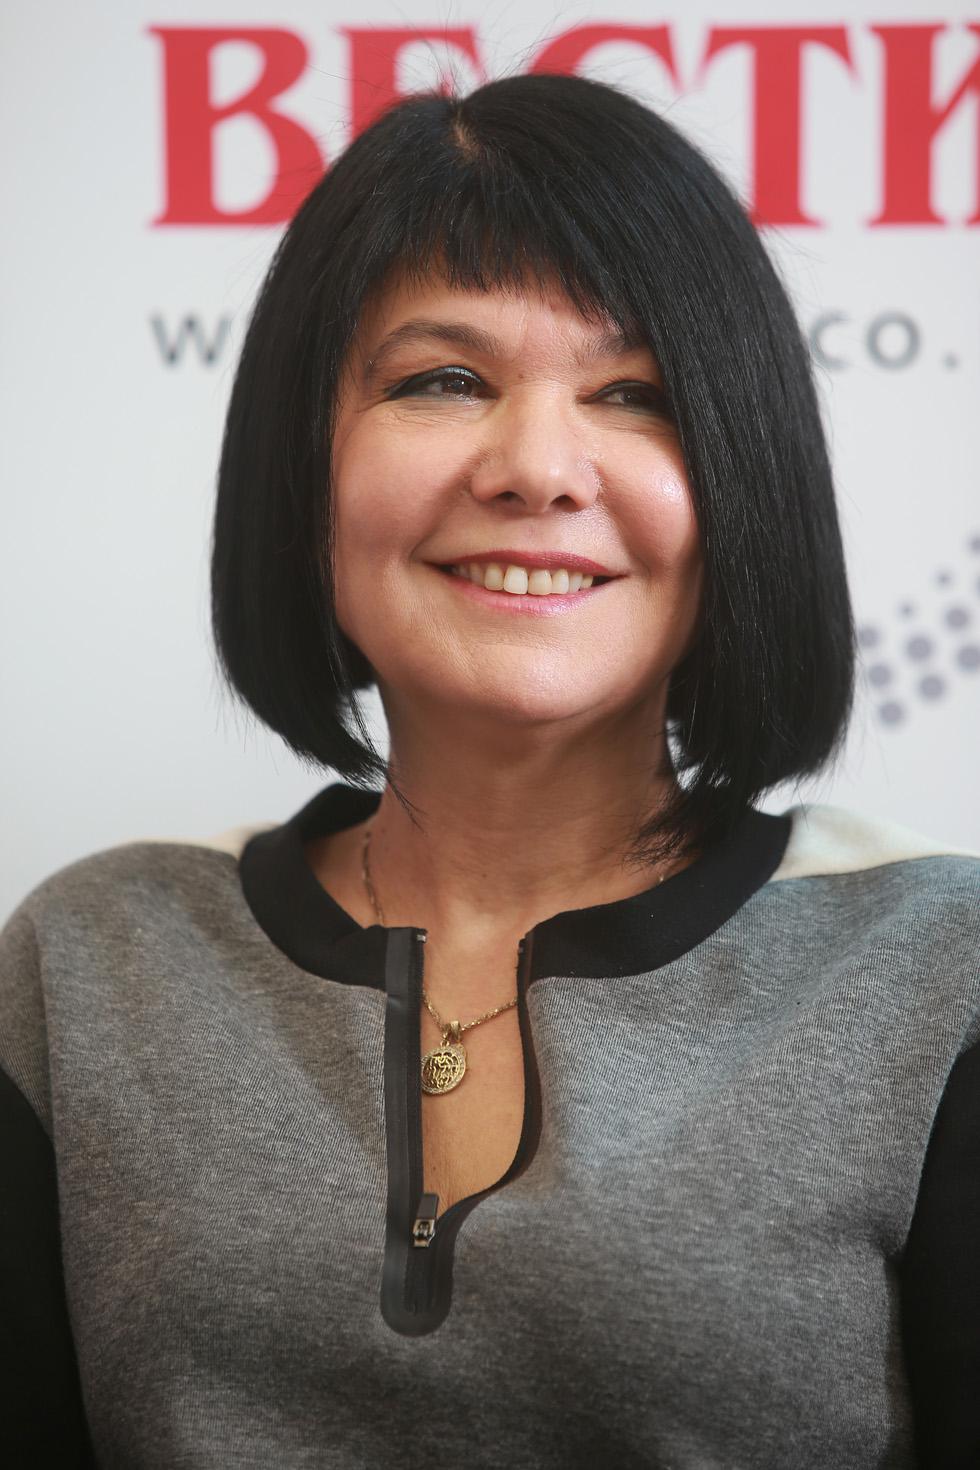 Ирина Вигдорчик. Фото: Авигайль Узи (Фото: Авигайль Узи)